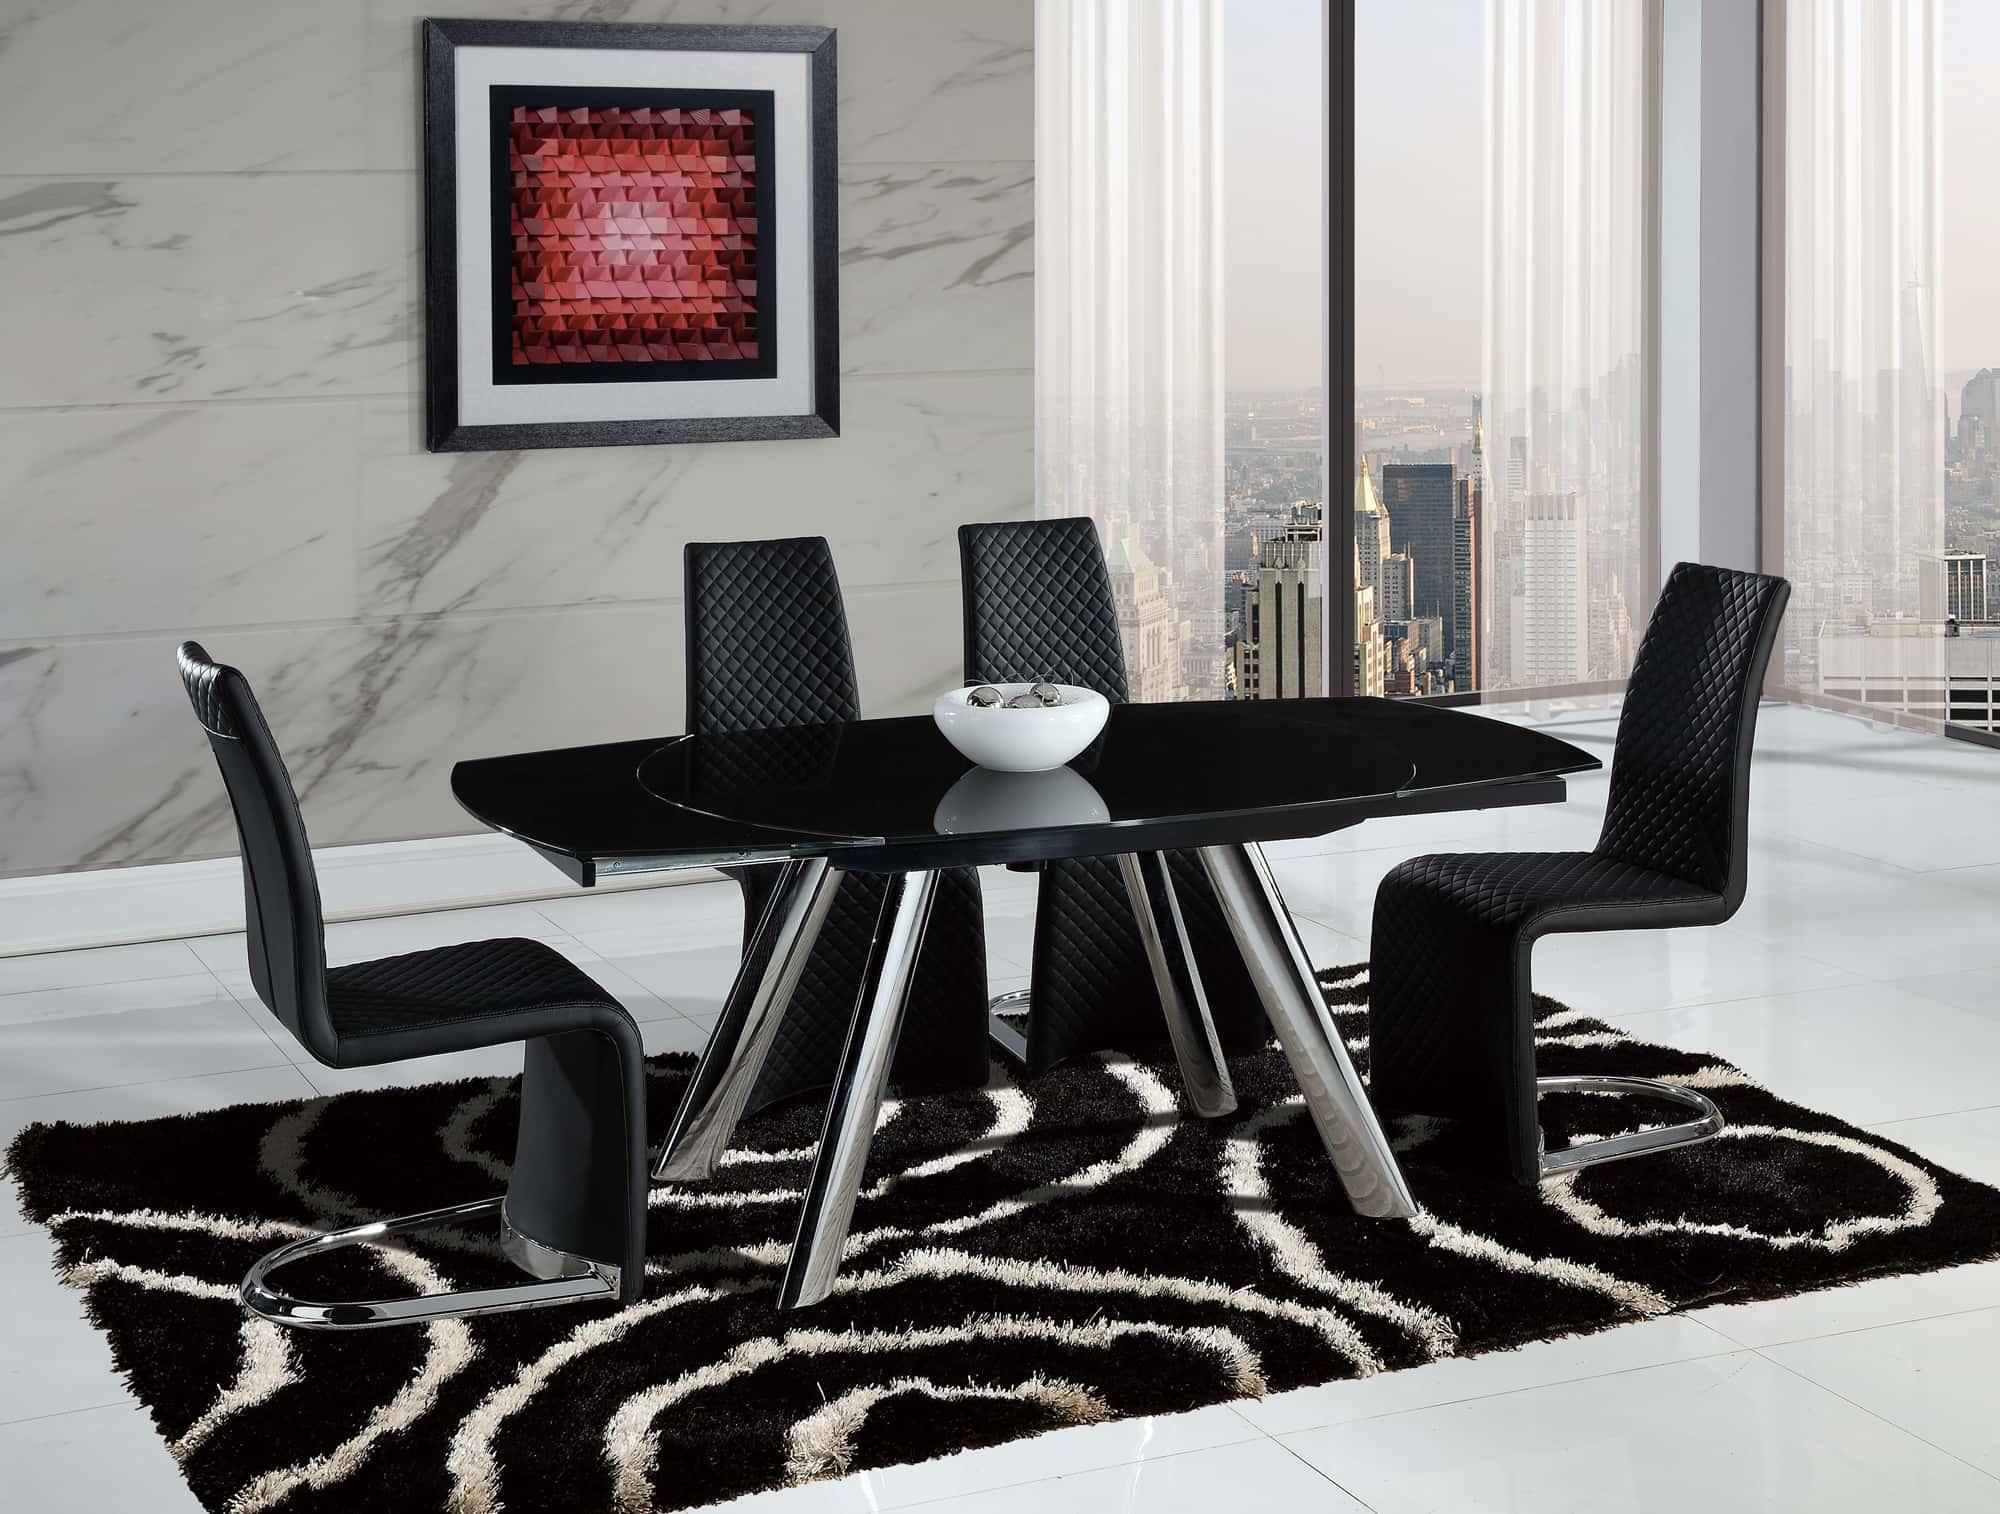 dining table d2320dt chrome/black glass topglobal furniture